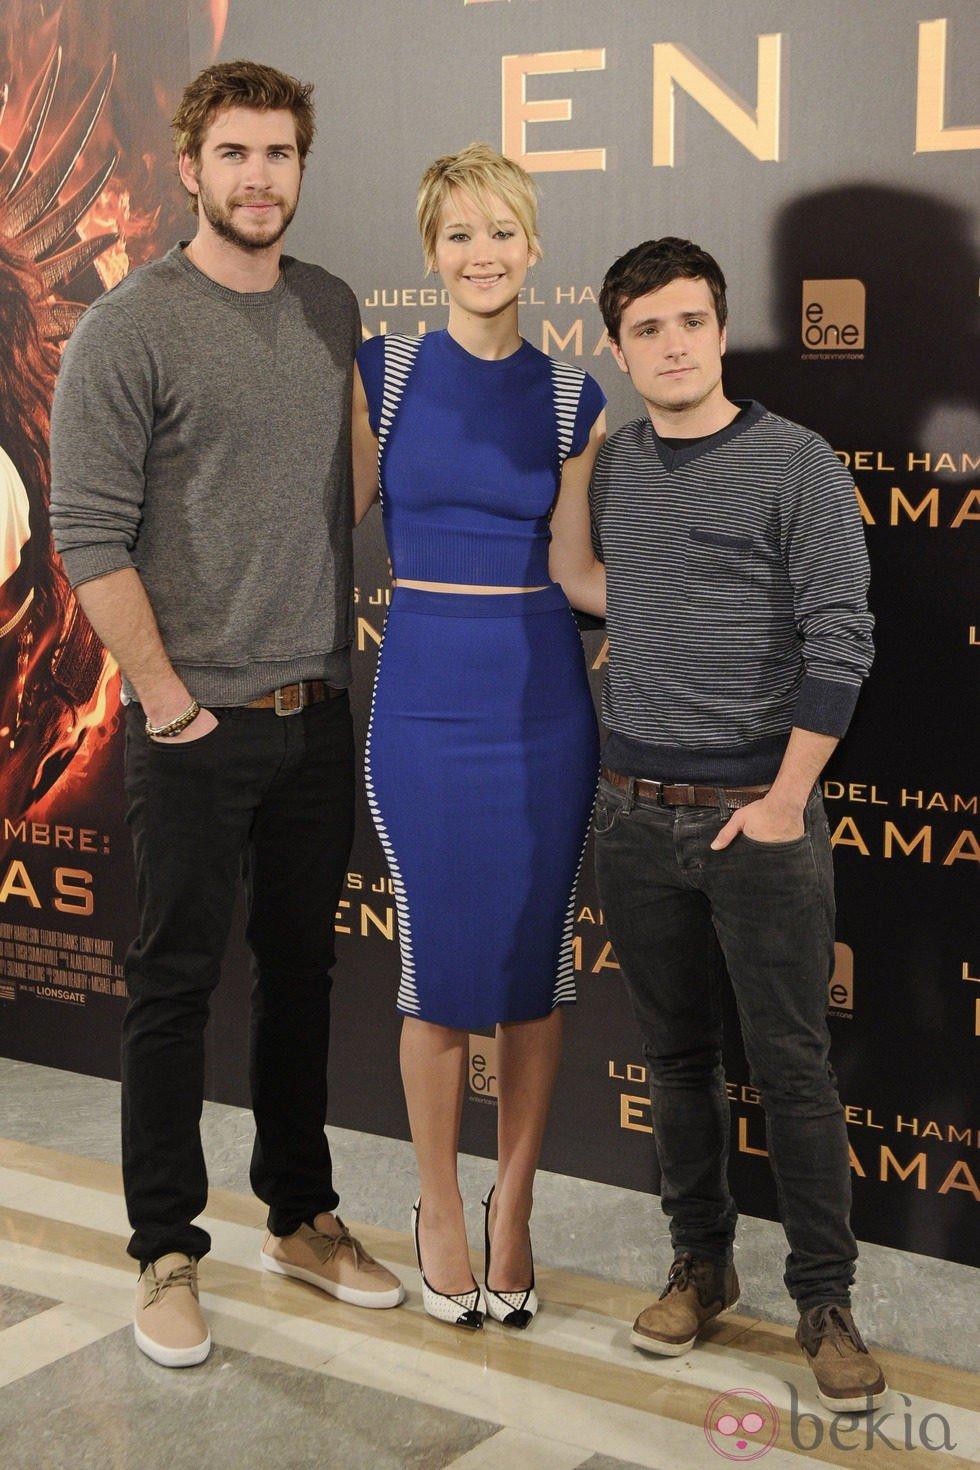 ¿Cuánto mide Jennifer Lawrence? - Altura - Real height 49567_liam-hemsworth-jennifer-lawrence-josh-hutcherson-juegos-hambre-llamas-madrid